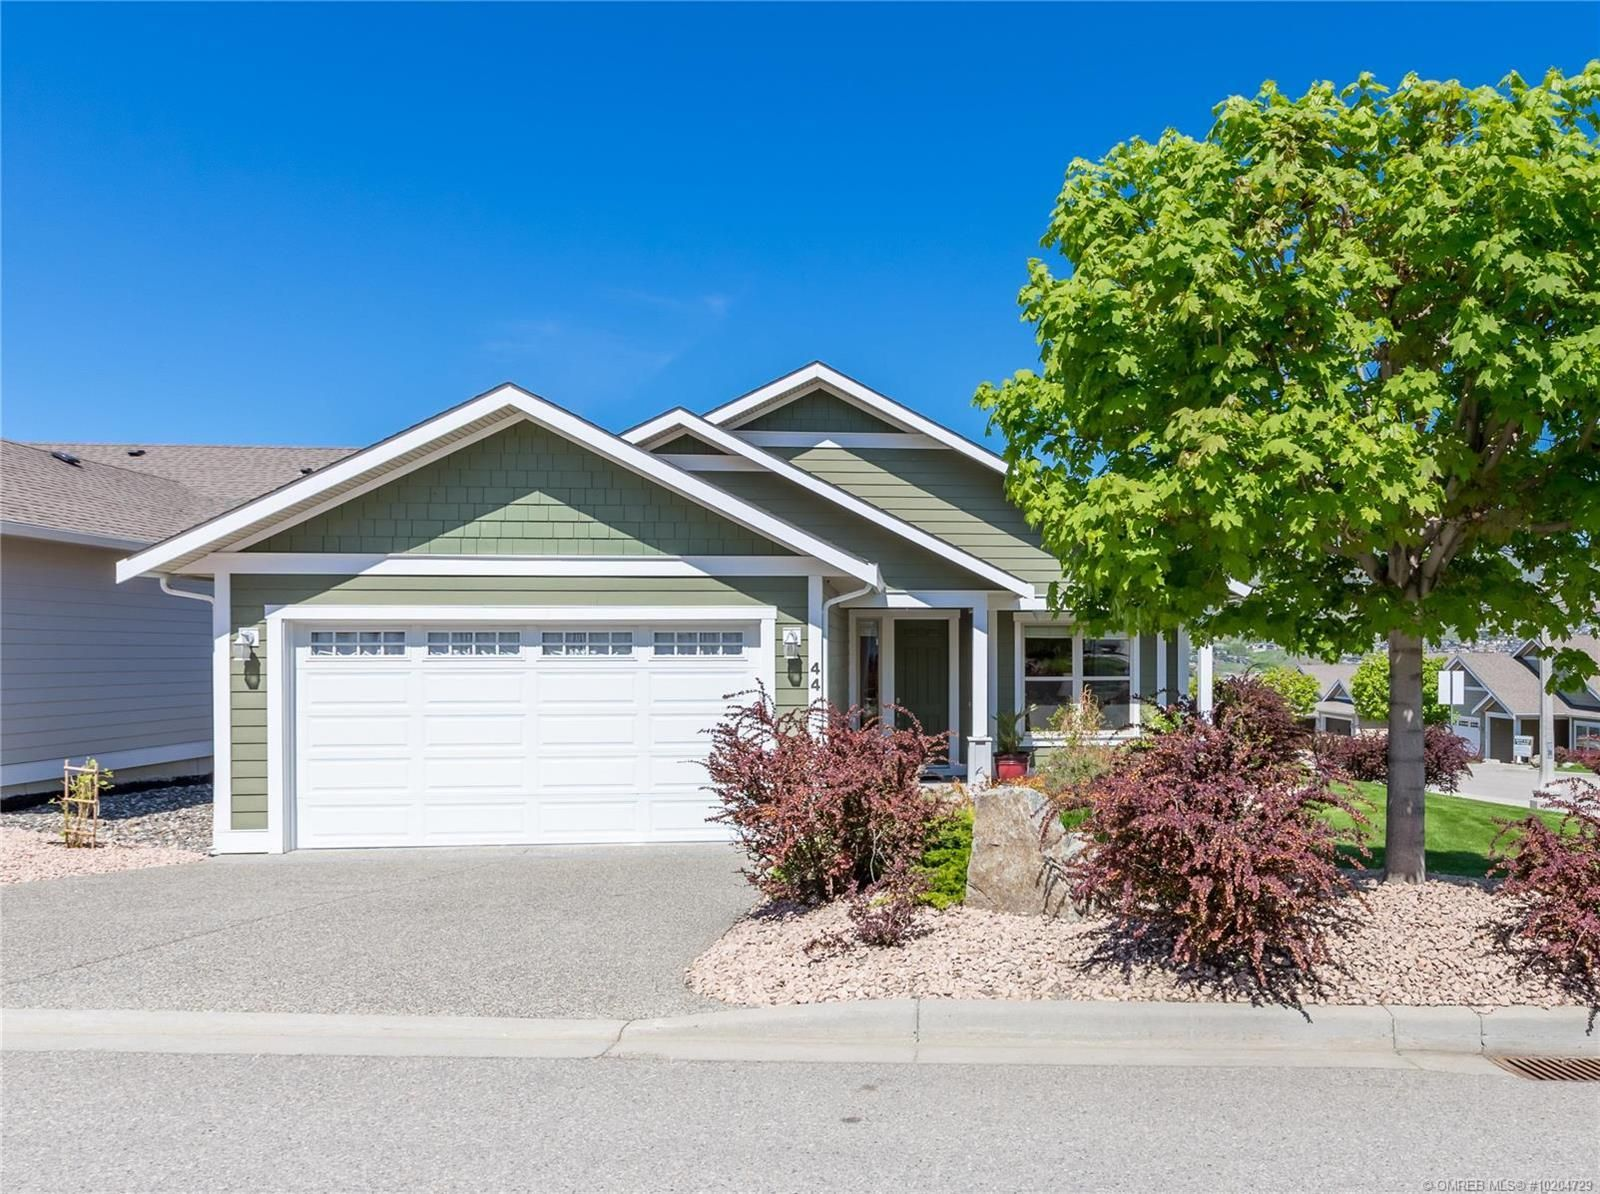 Main Photo: #44 7760 Okanagan Landing Road, in Vernon: House for sale : MLS®# 10204729